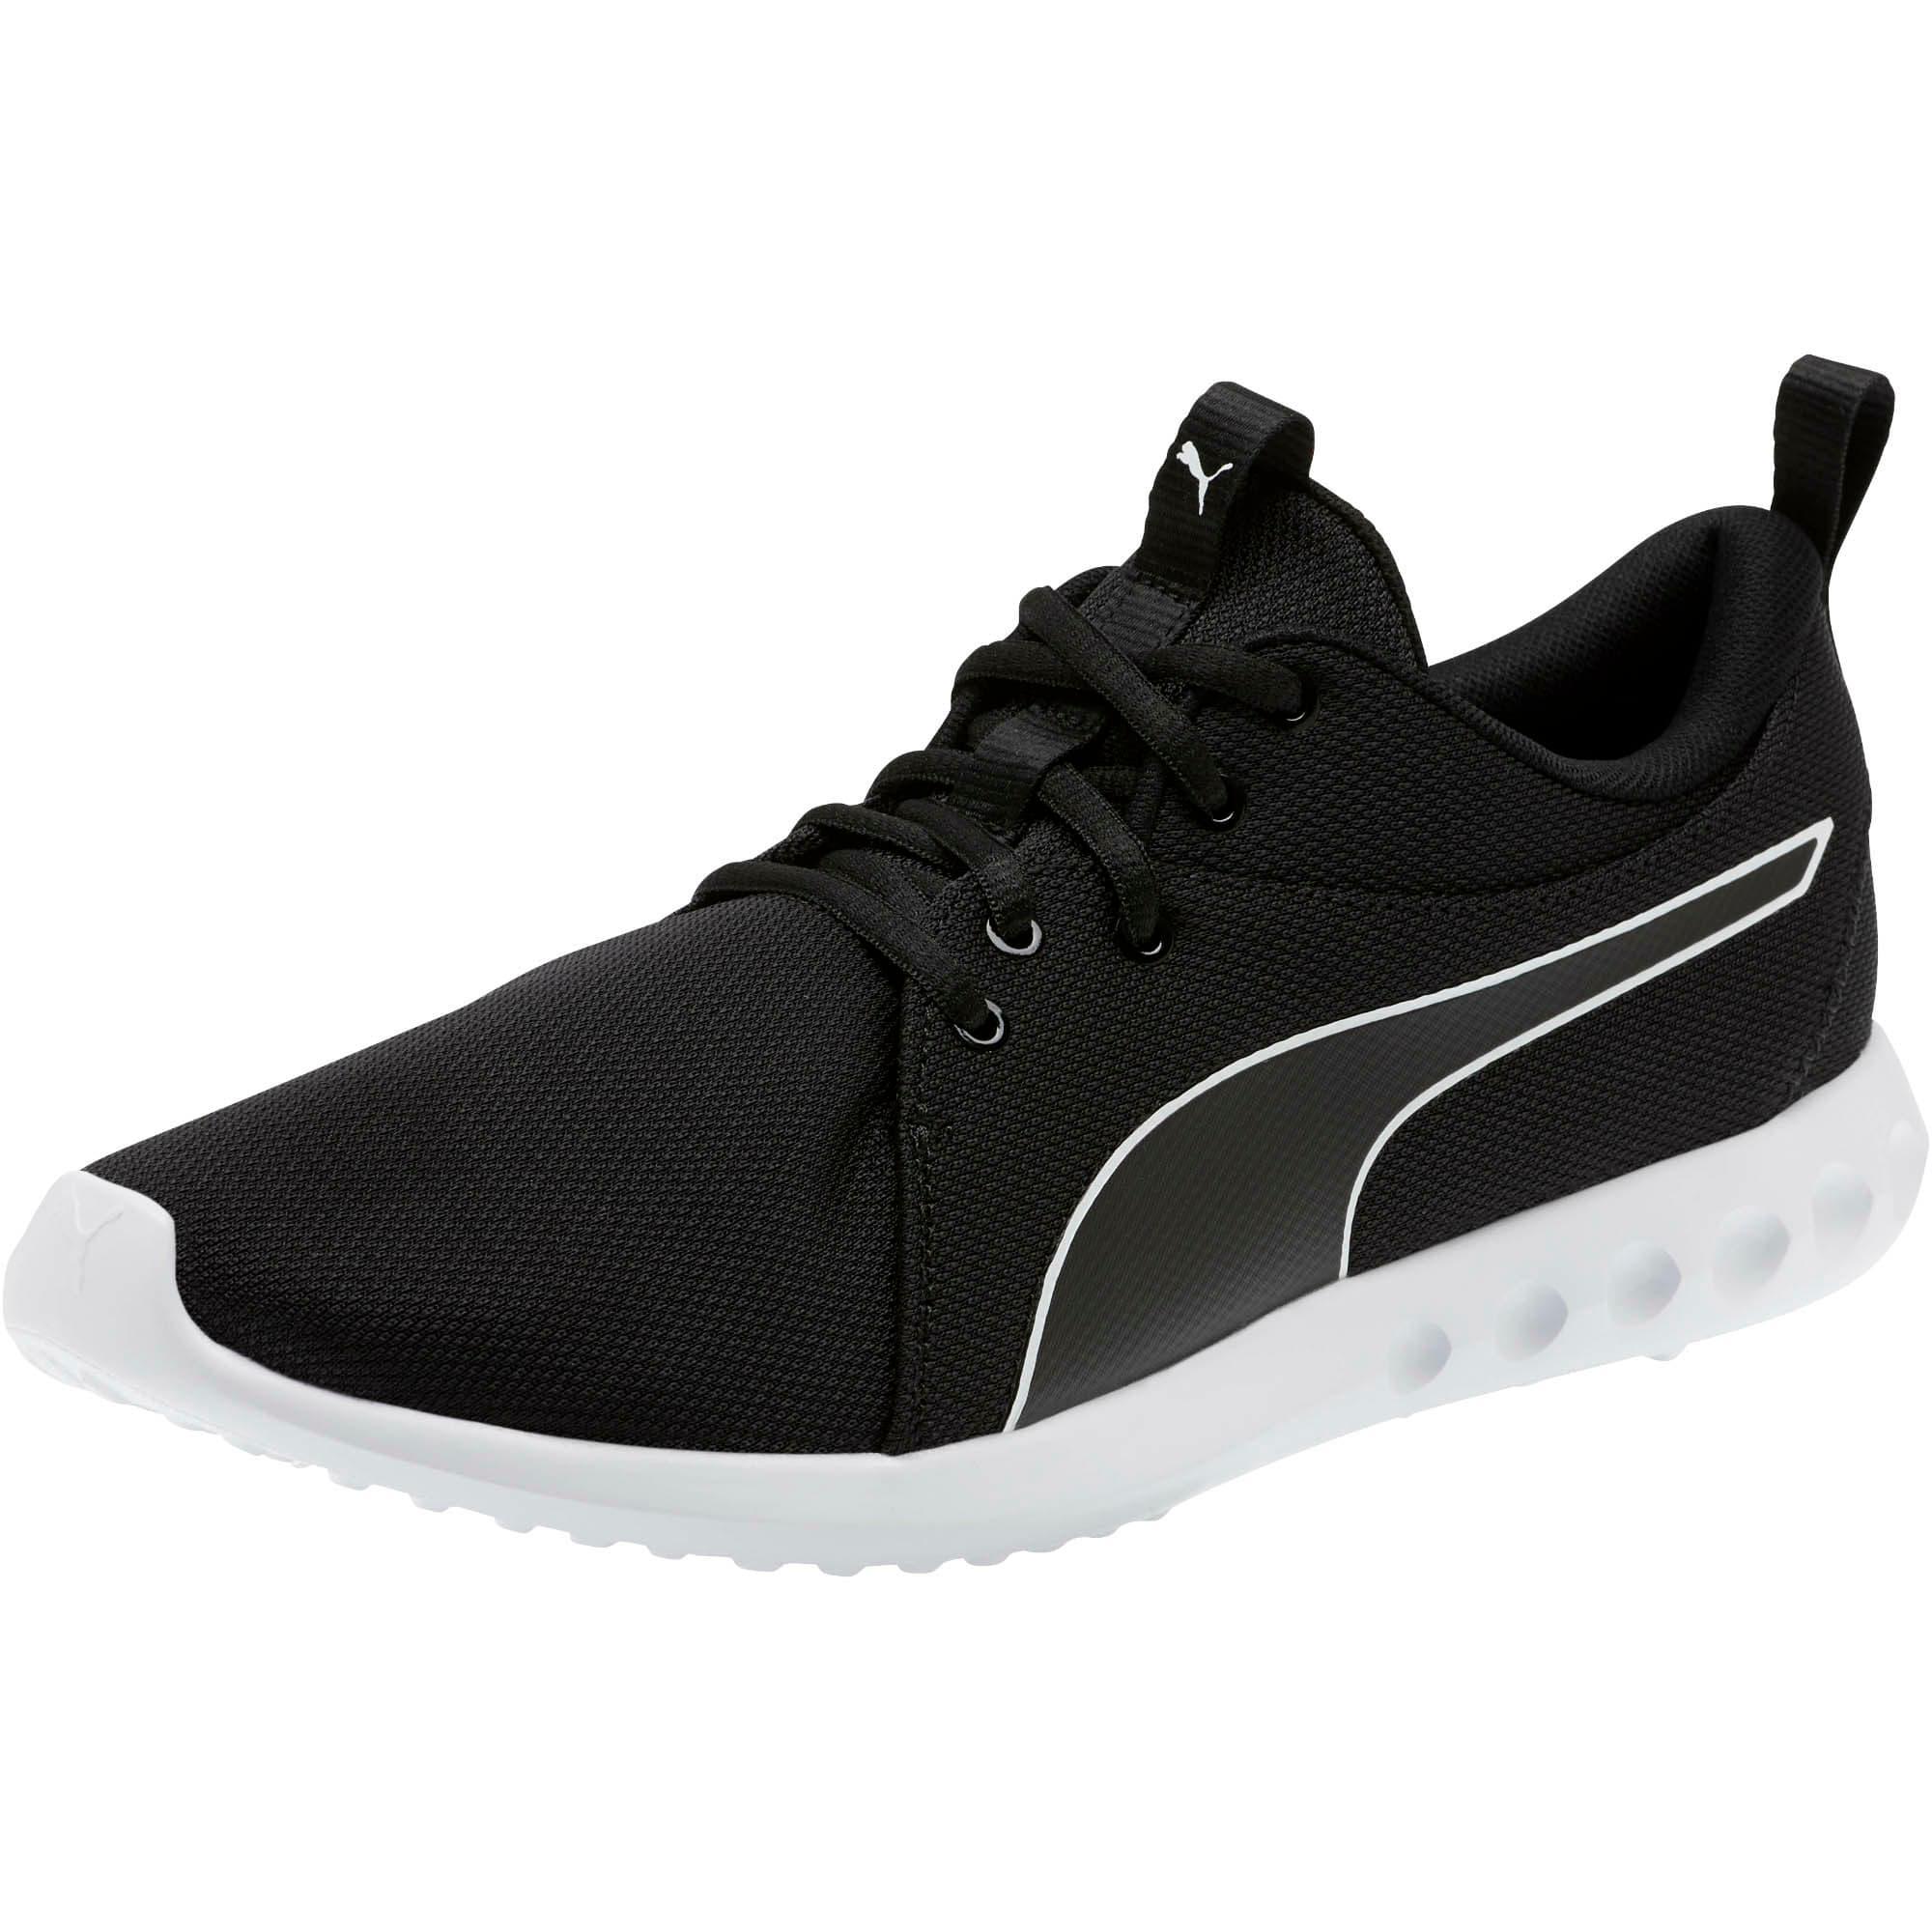 Thumbnail 1 of Carson 2 Cosmo Men's Running Shoes, Puma Black-Puma White, medium